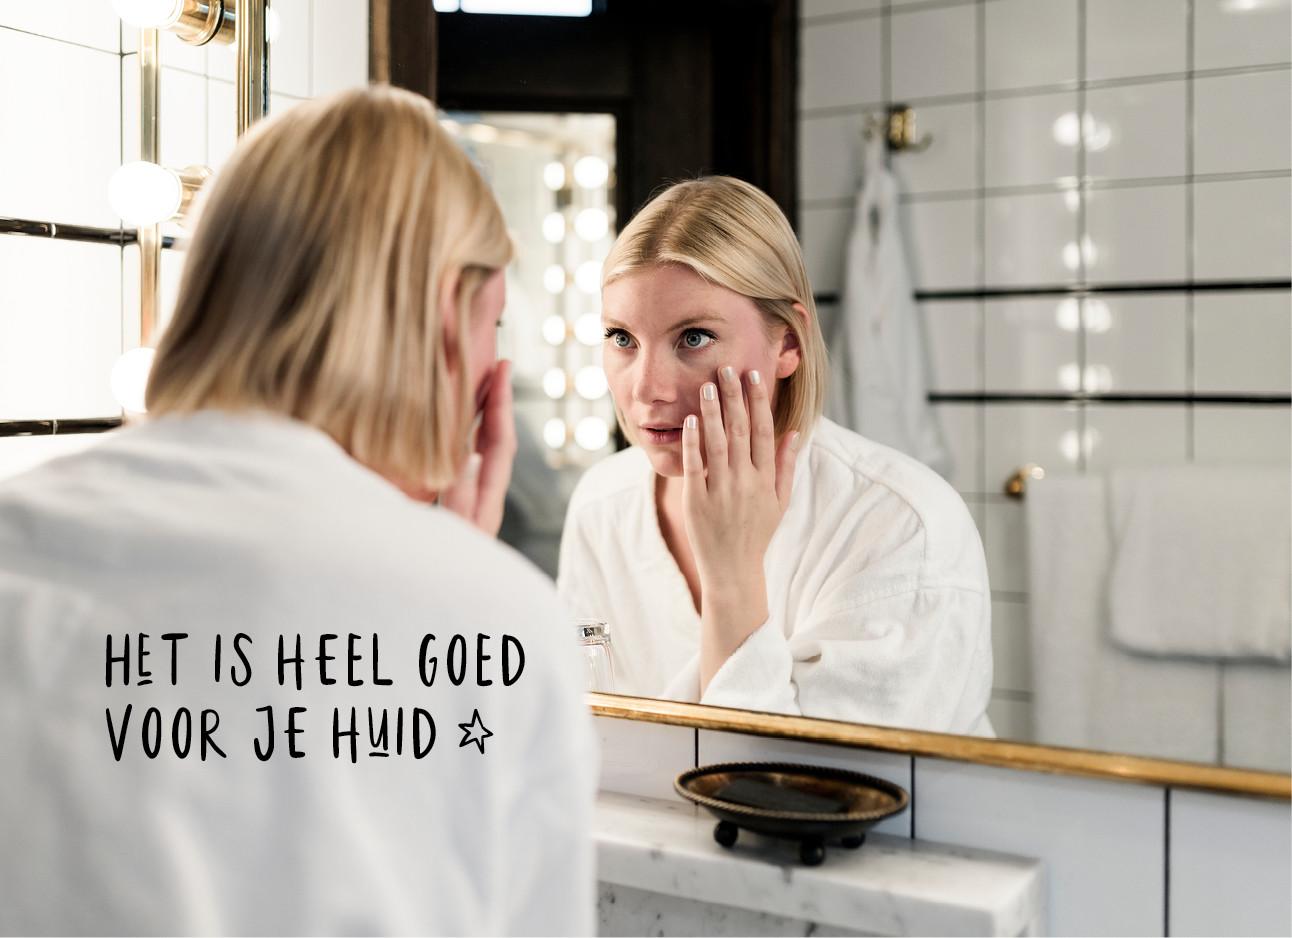 vrouw kijkt in spiegel in badjas